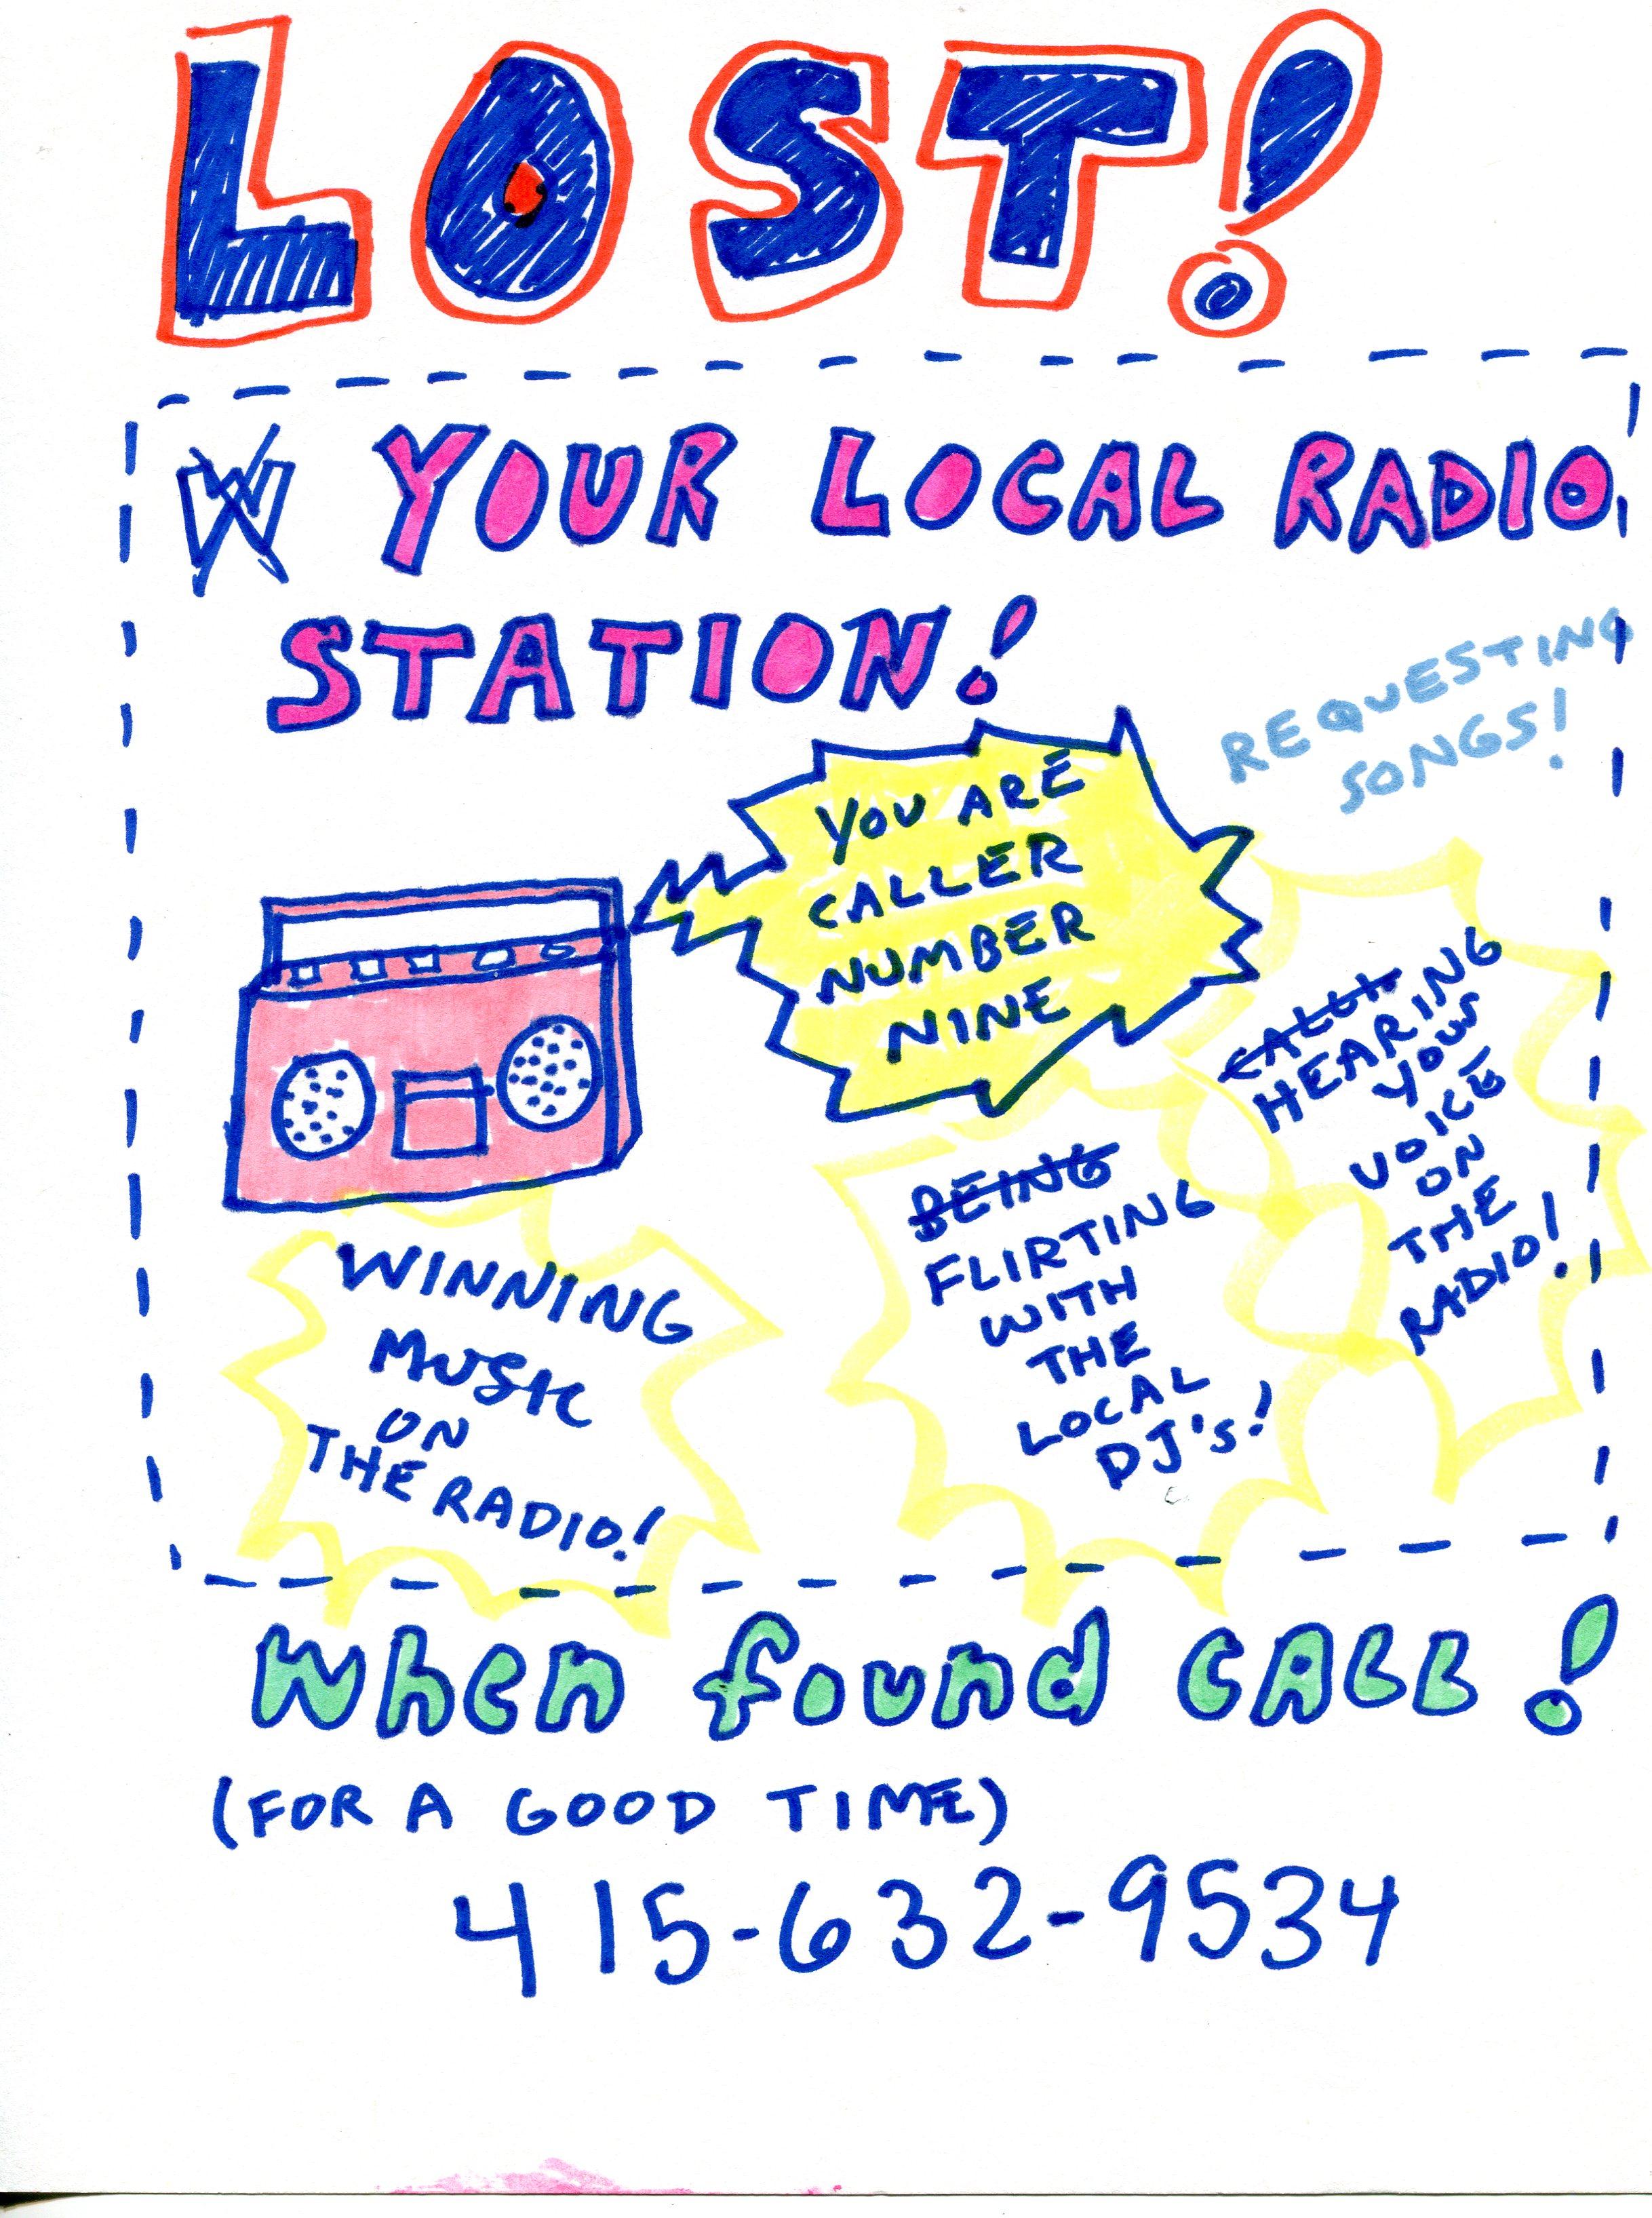 localradiostation.jpg